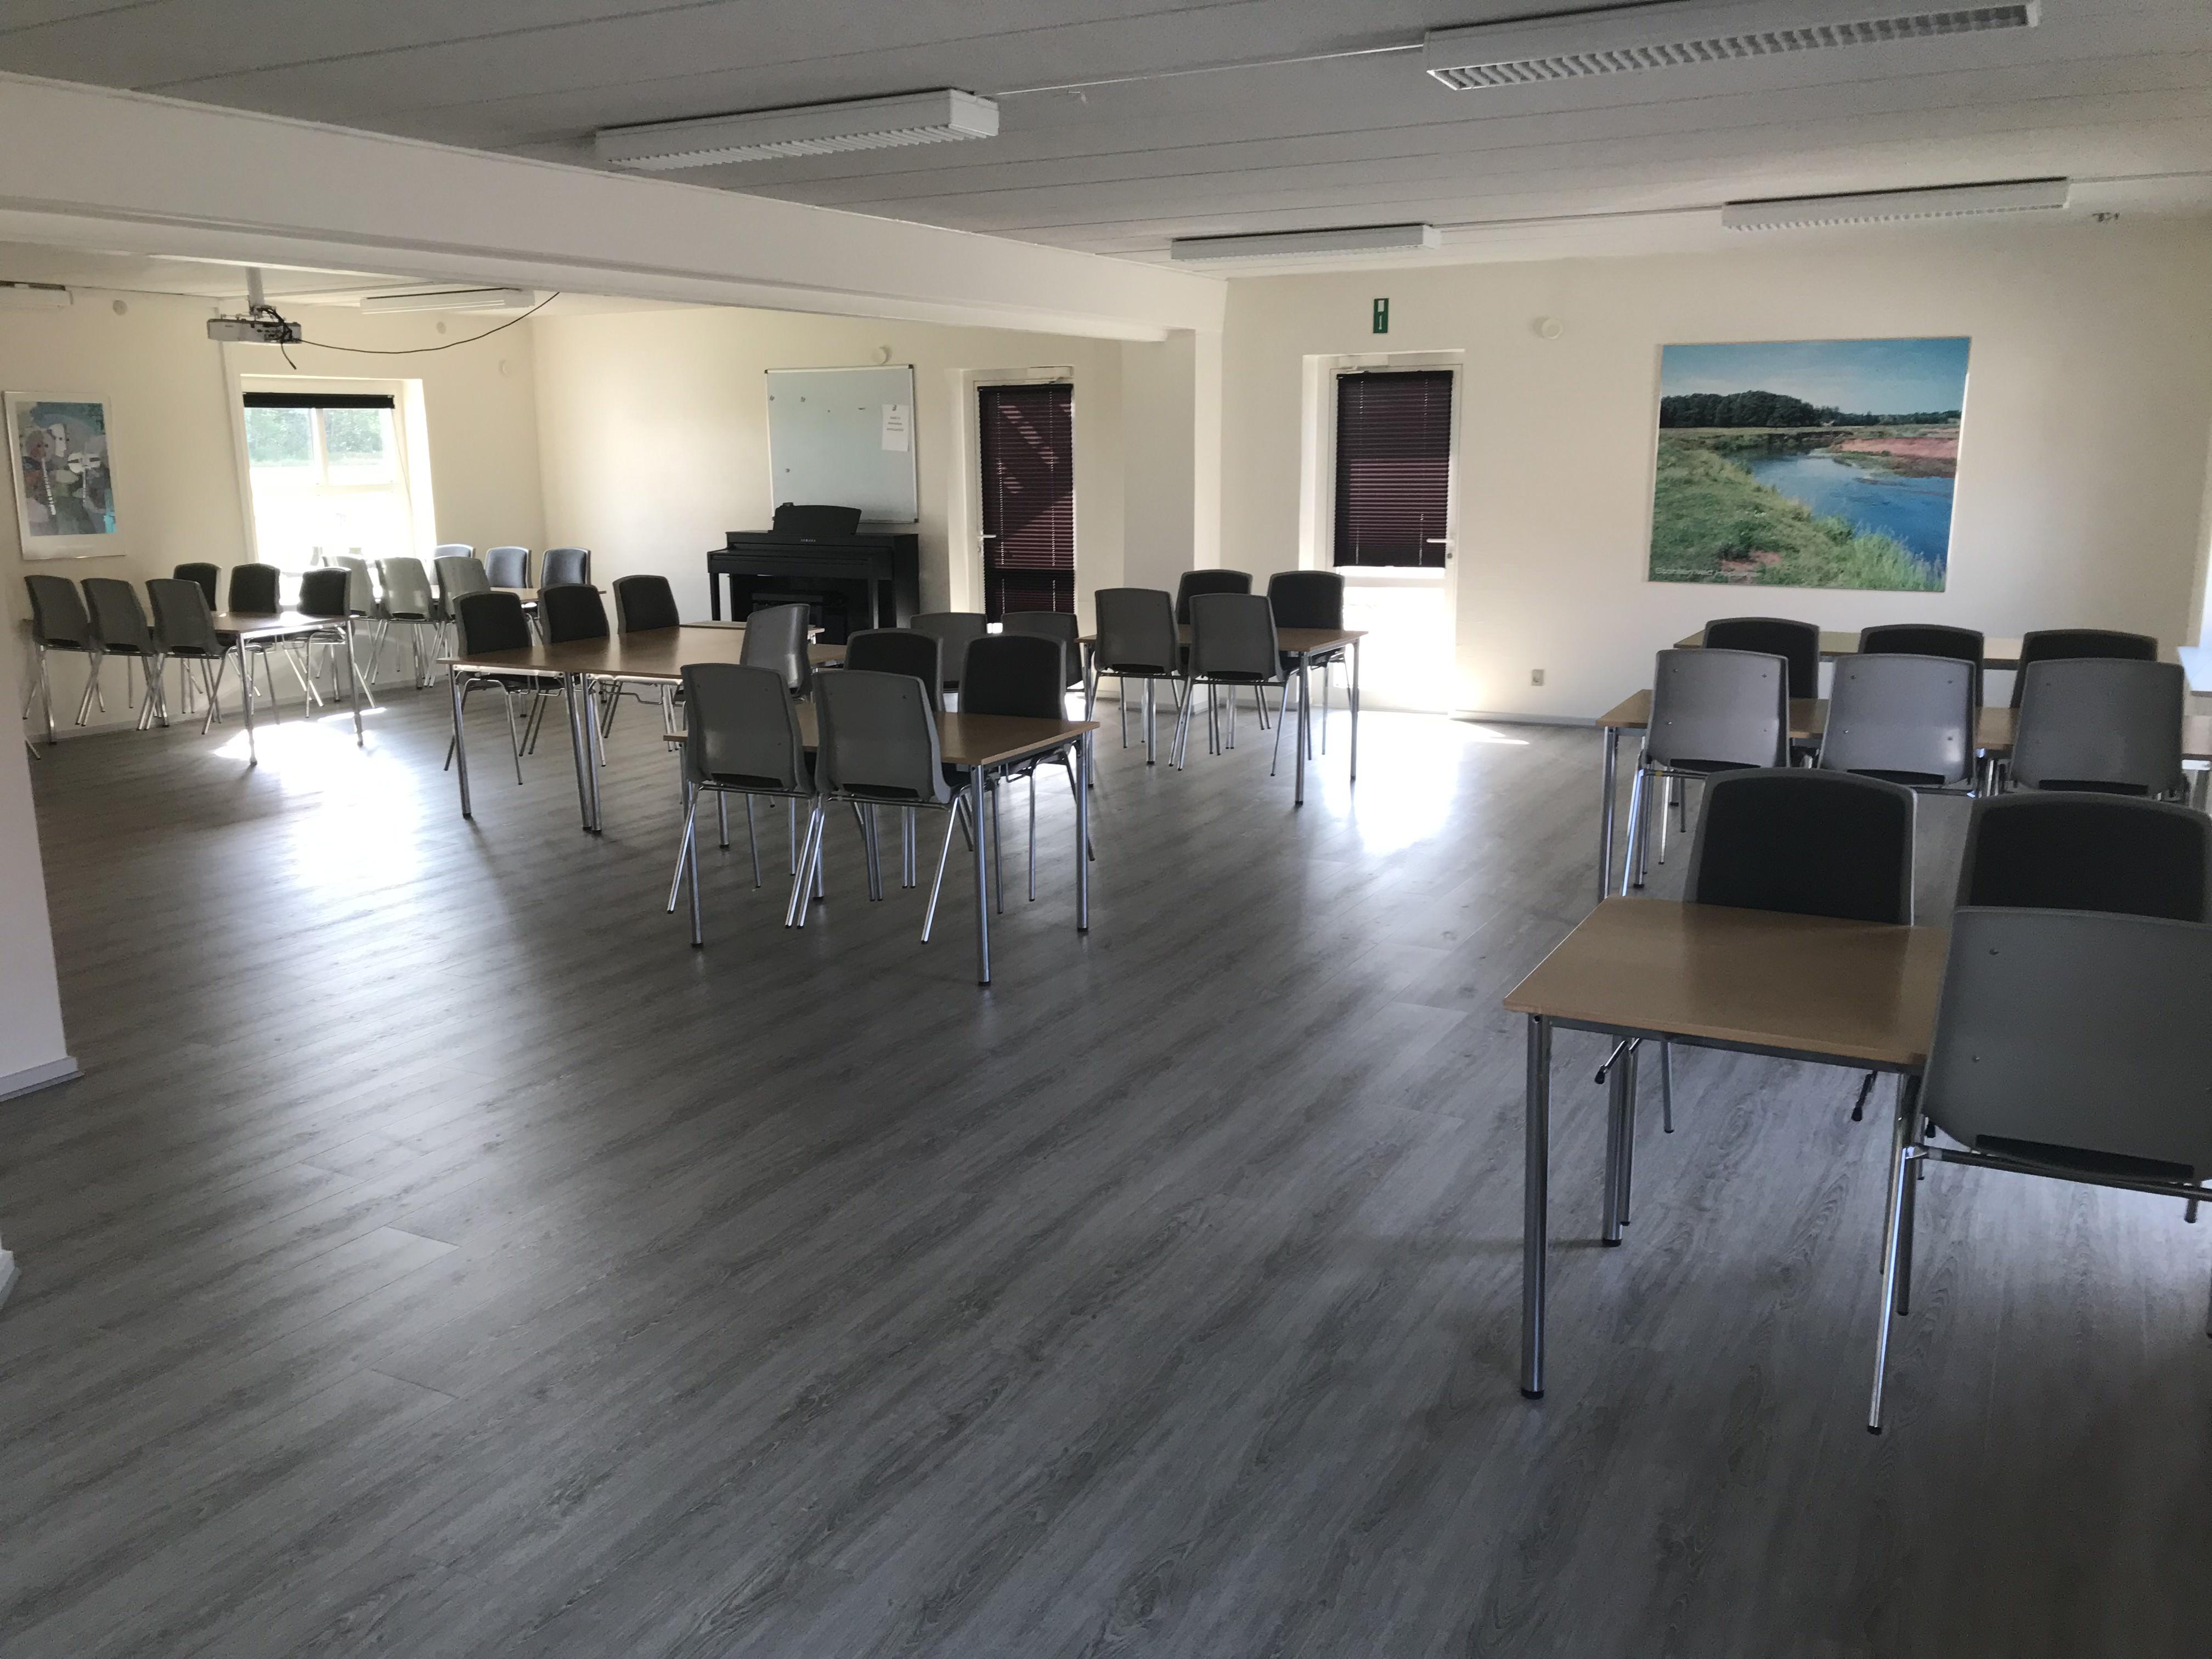 Centerrummet